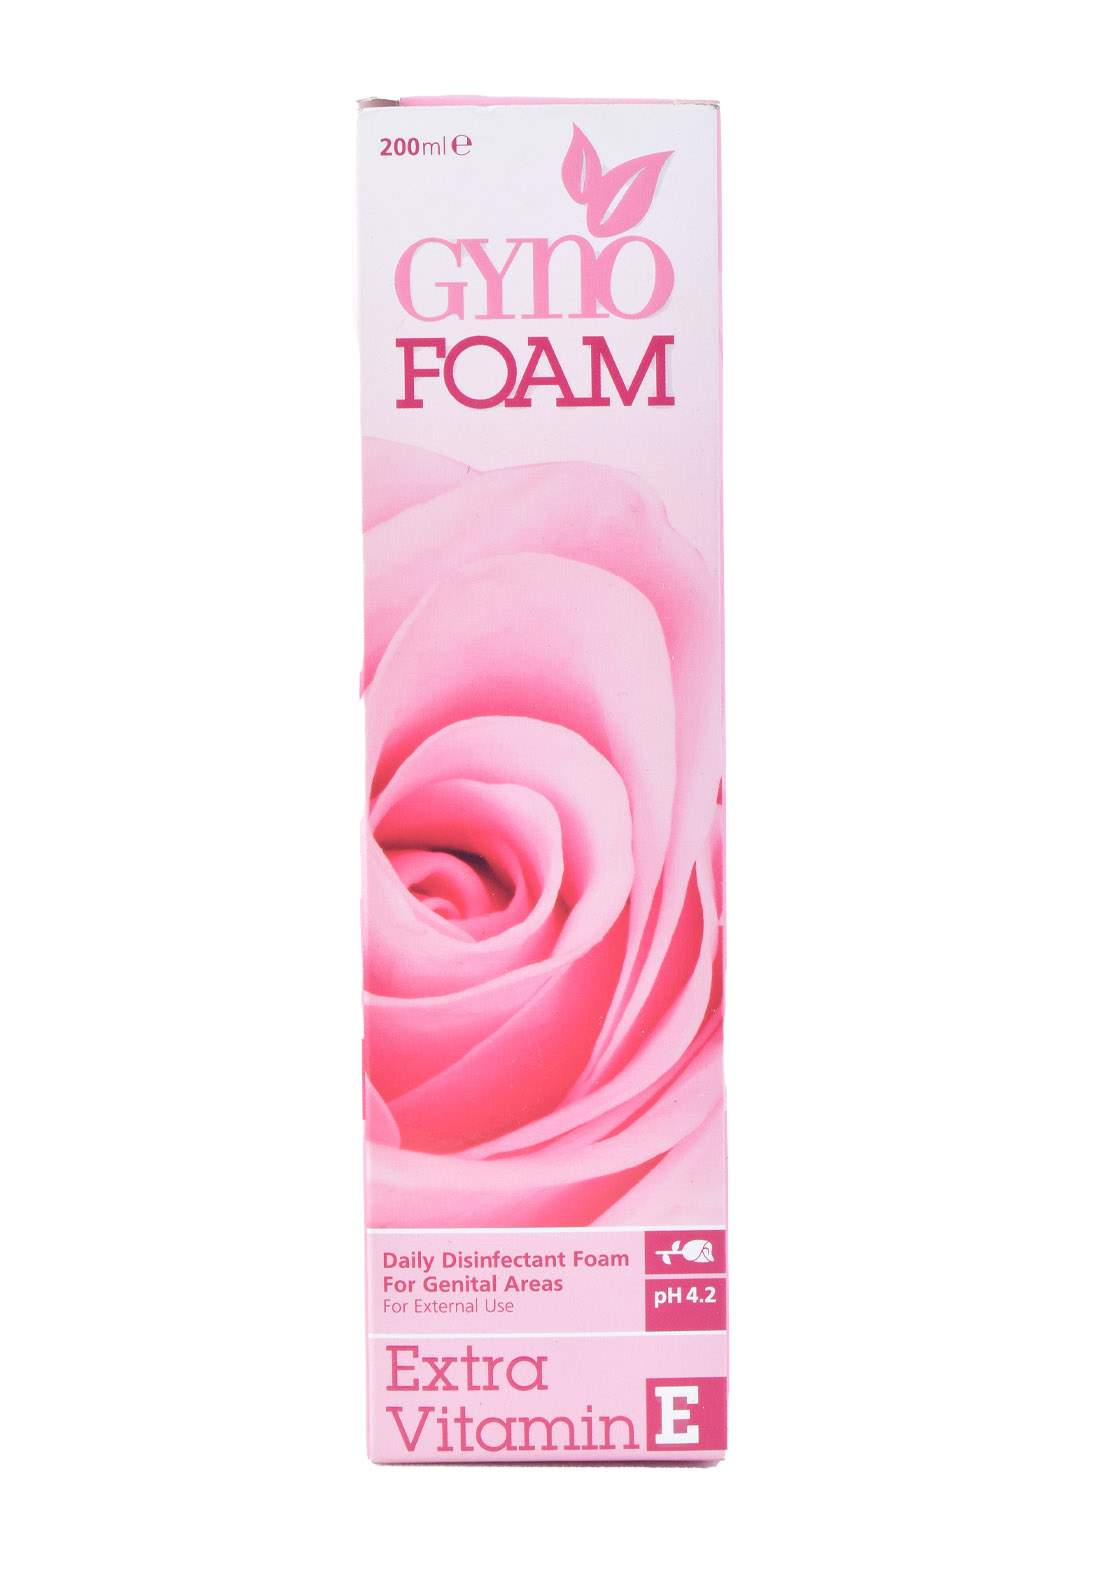 غسول رغوي نسائي Turkuaz Konicare Gyno Foam Daily Cleaning Foam 200ml